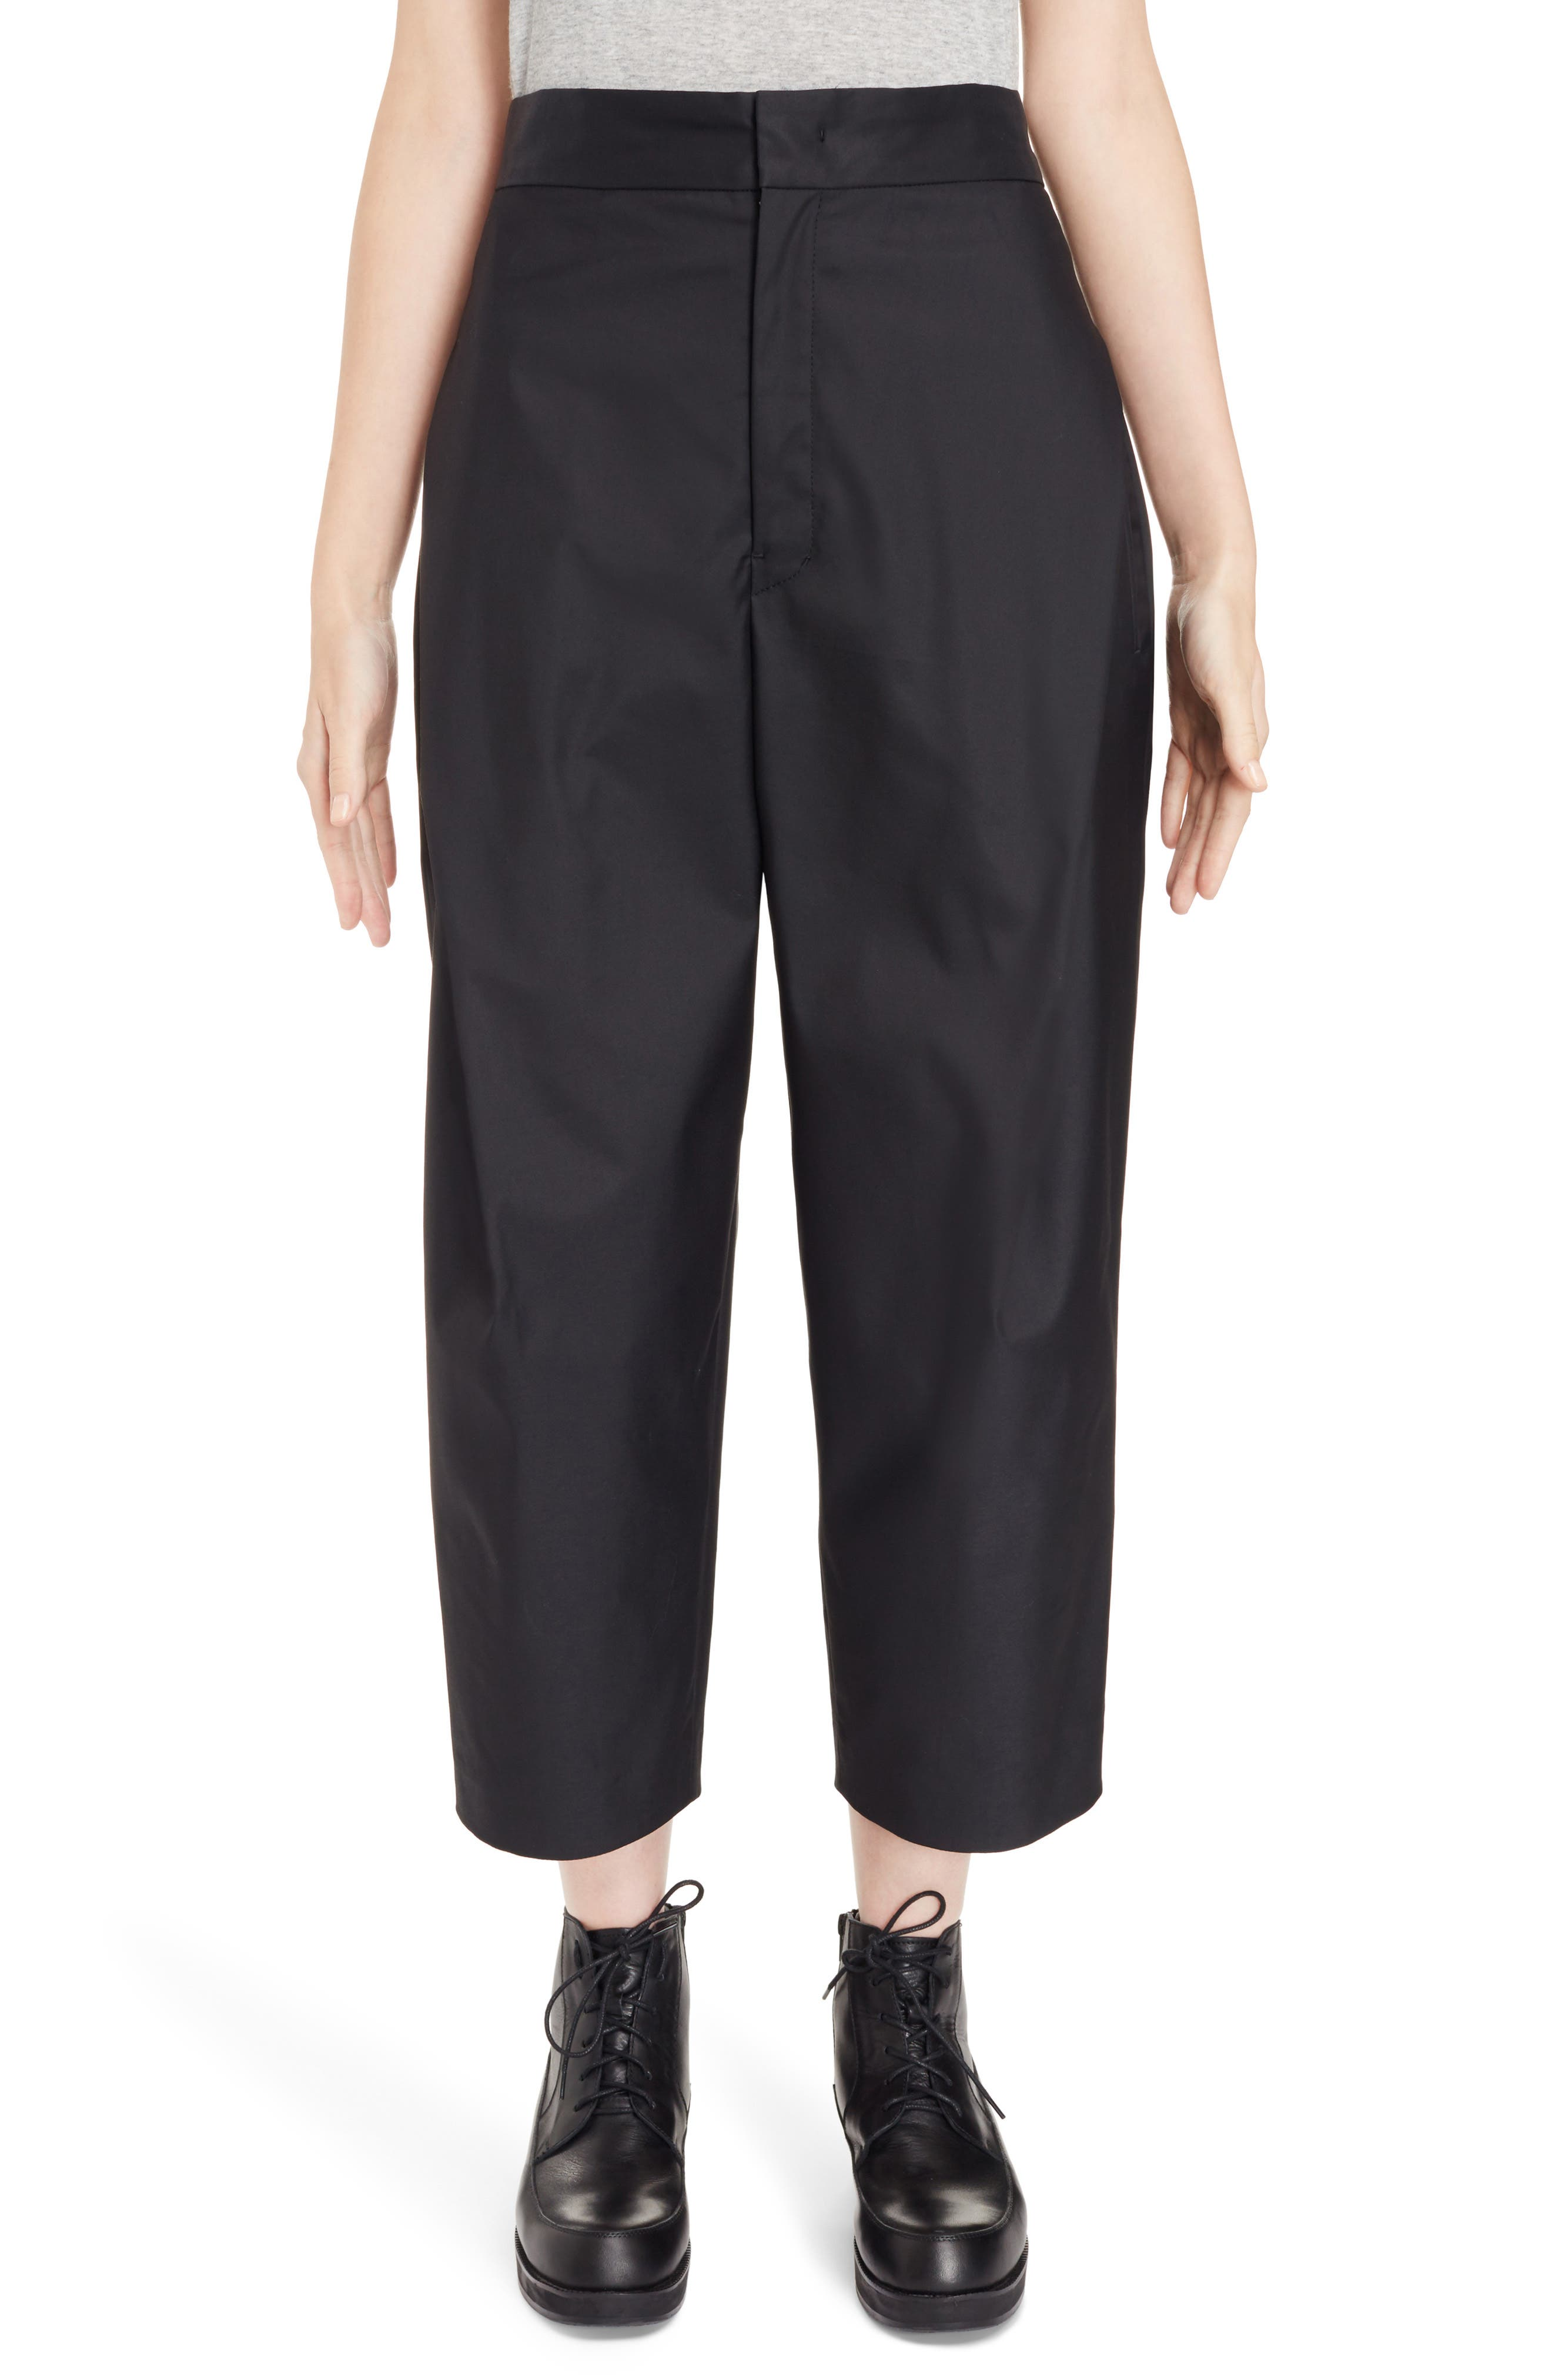 Y's by Yohji Yamamoto High Waist Pants